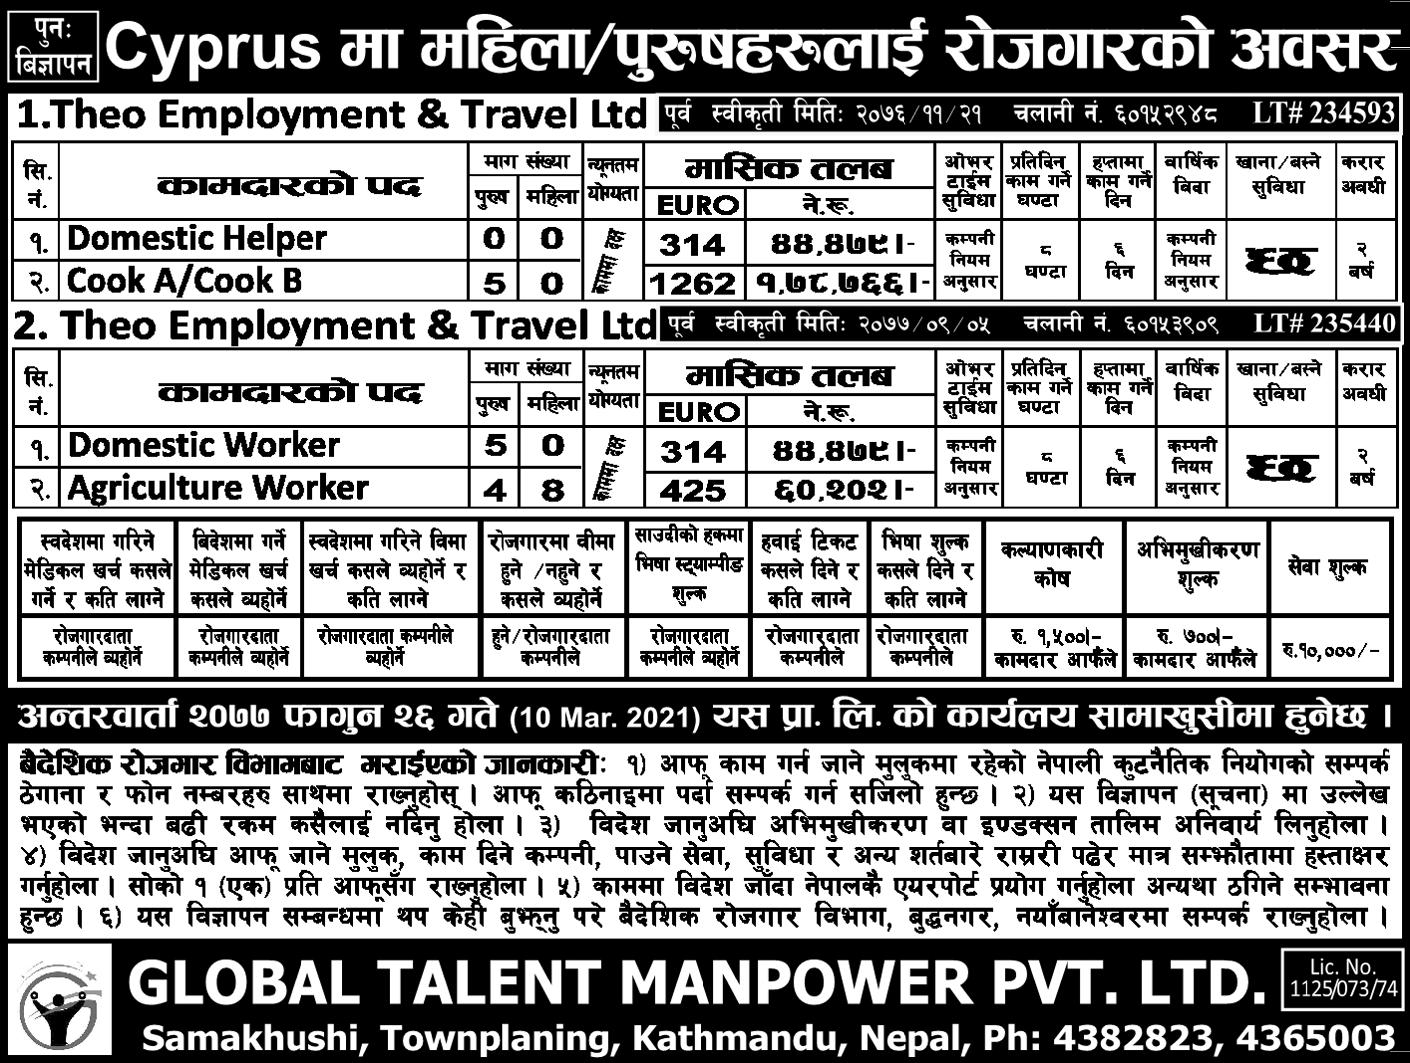 Cyprus Job demand in nepal